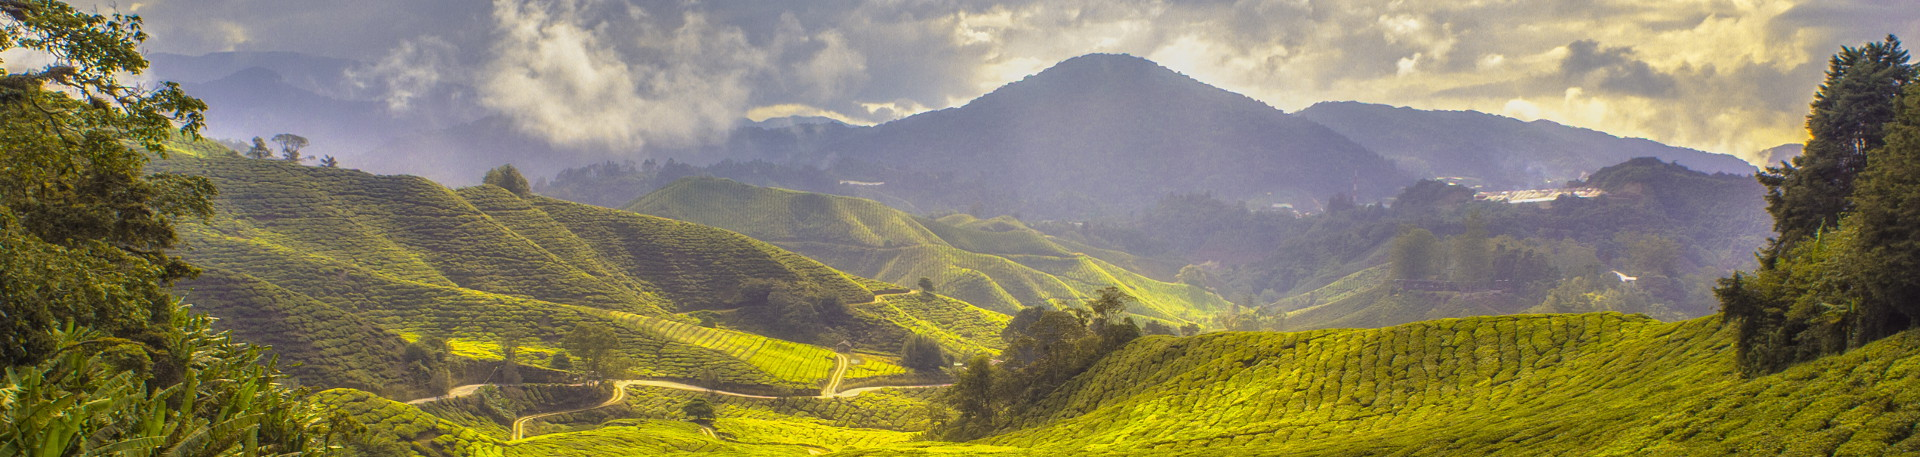 Triage web photo Malaysia